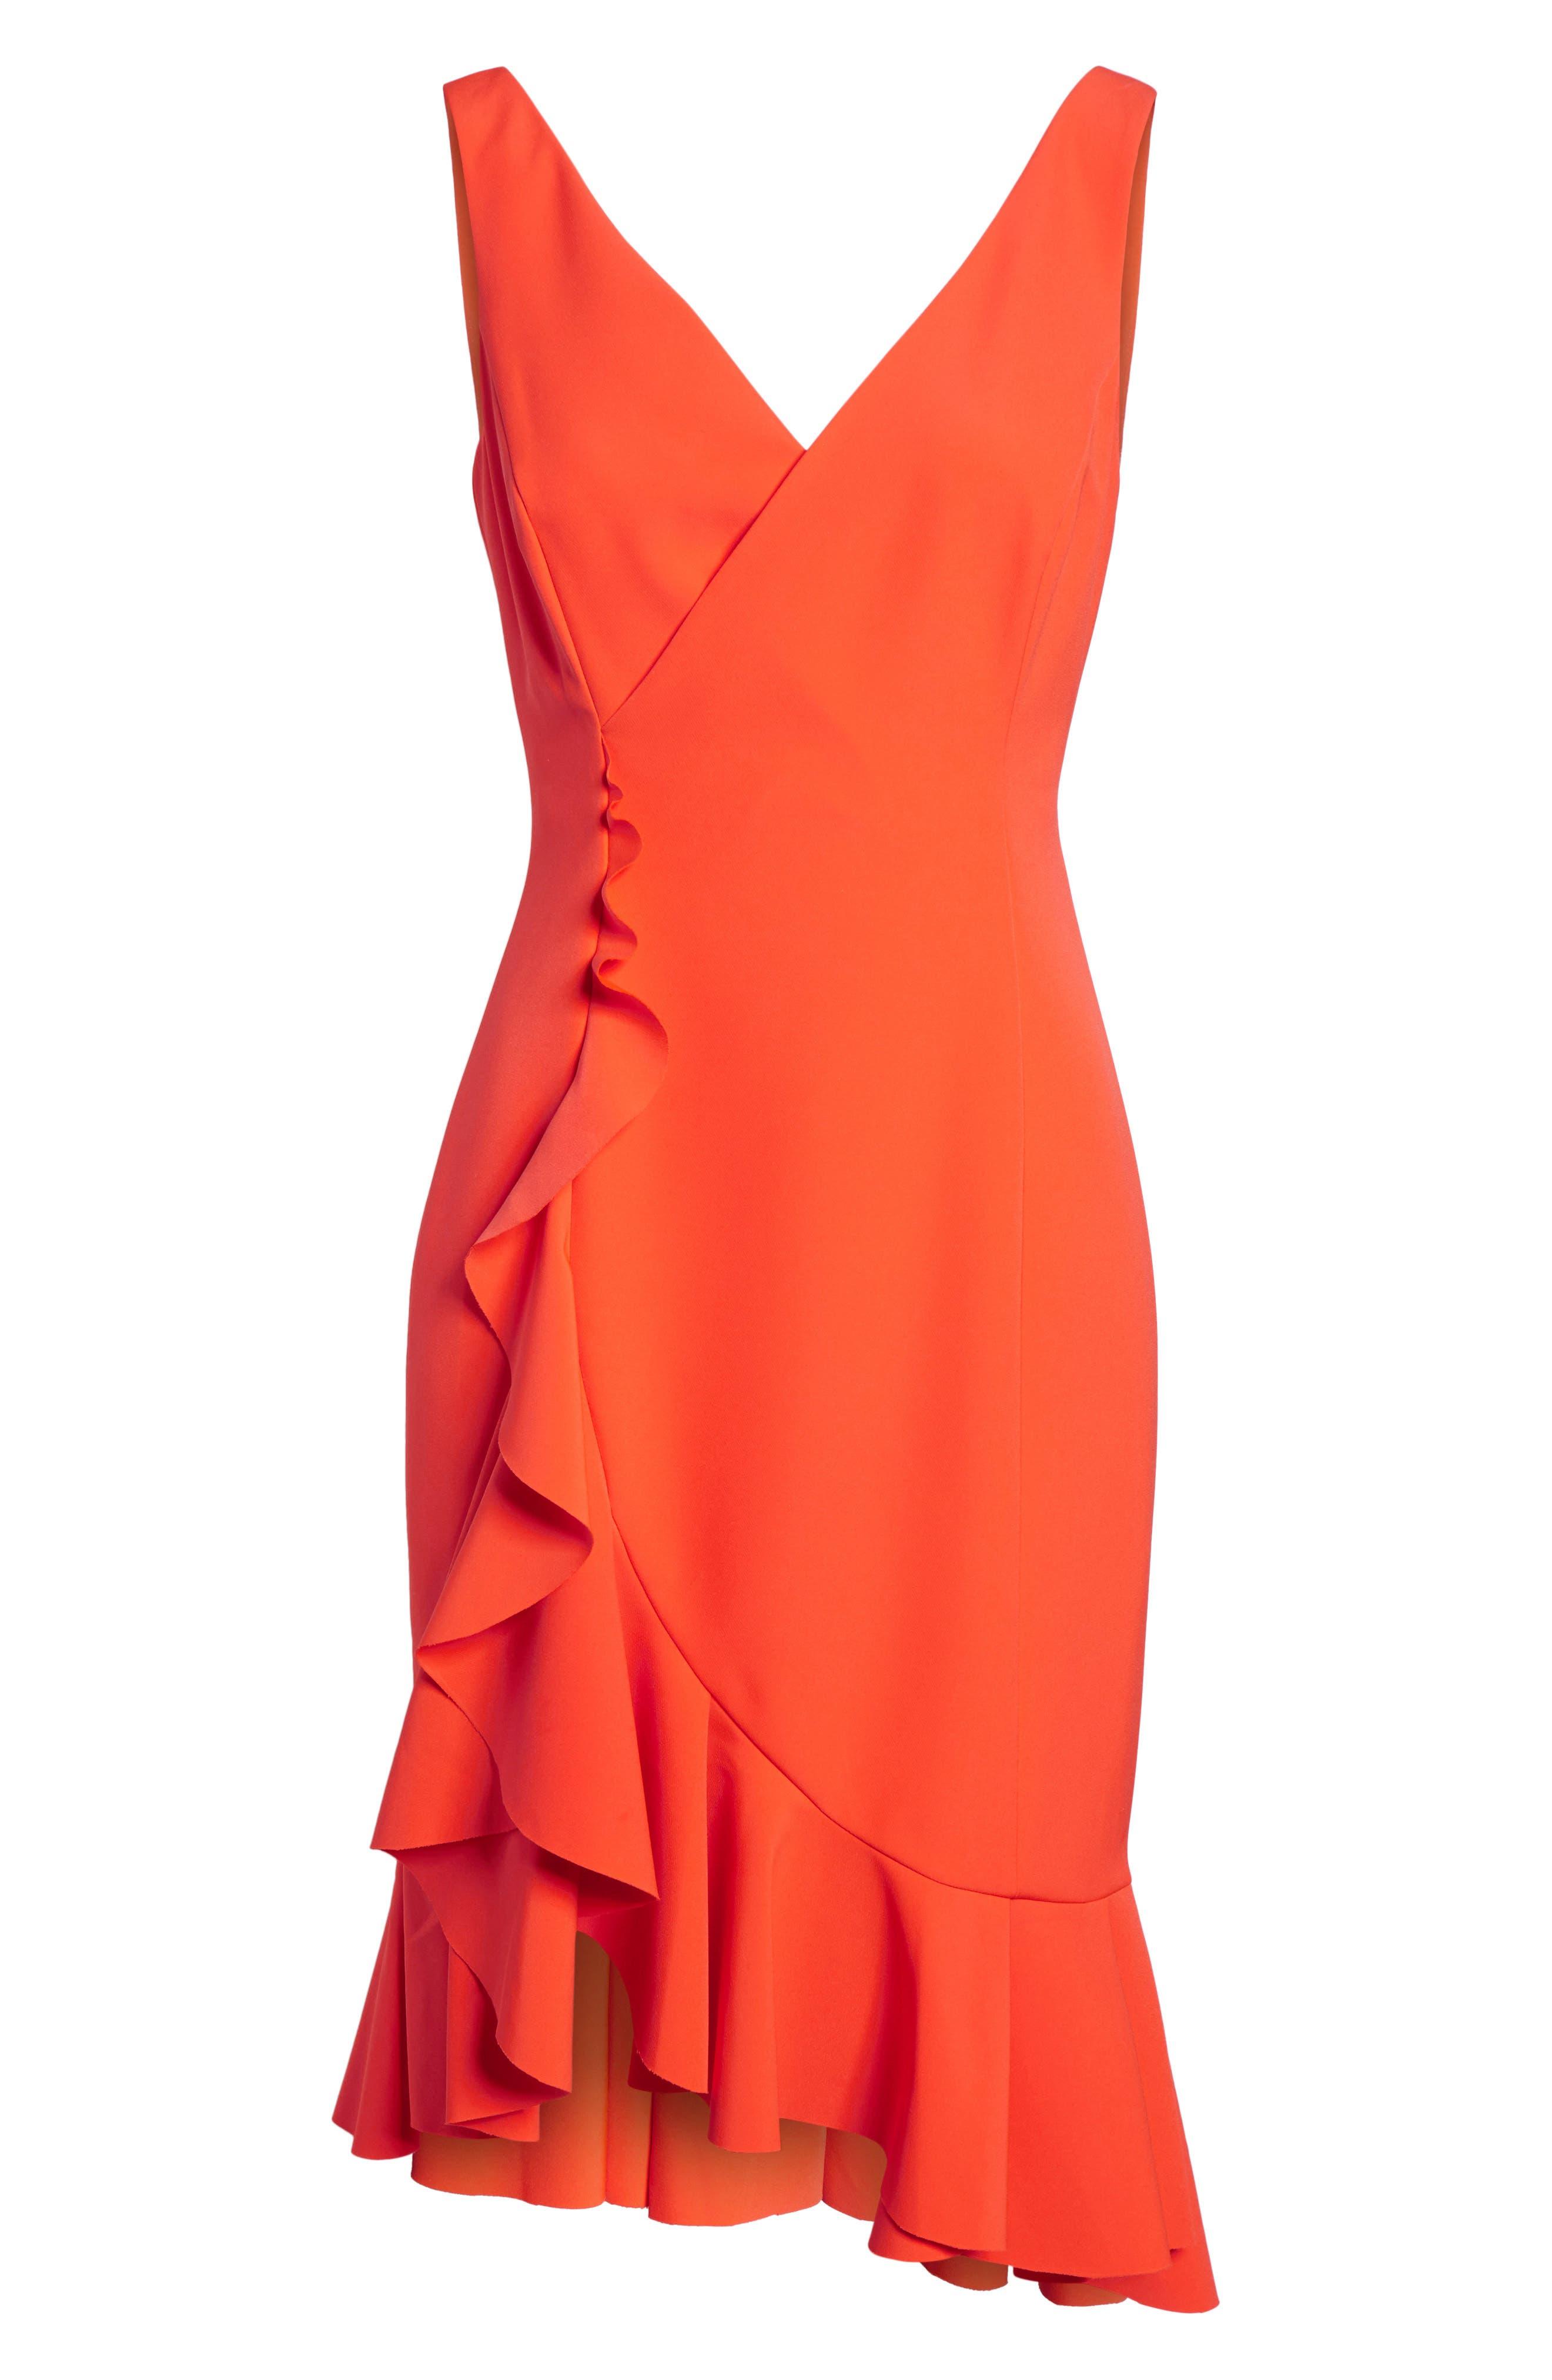 Laguna Ruffle Sheath Dress,                             Alternate thumbnail 7, color,                             Orange